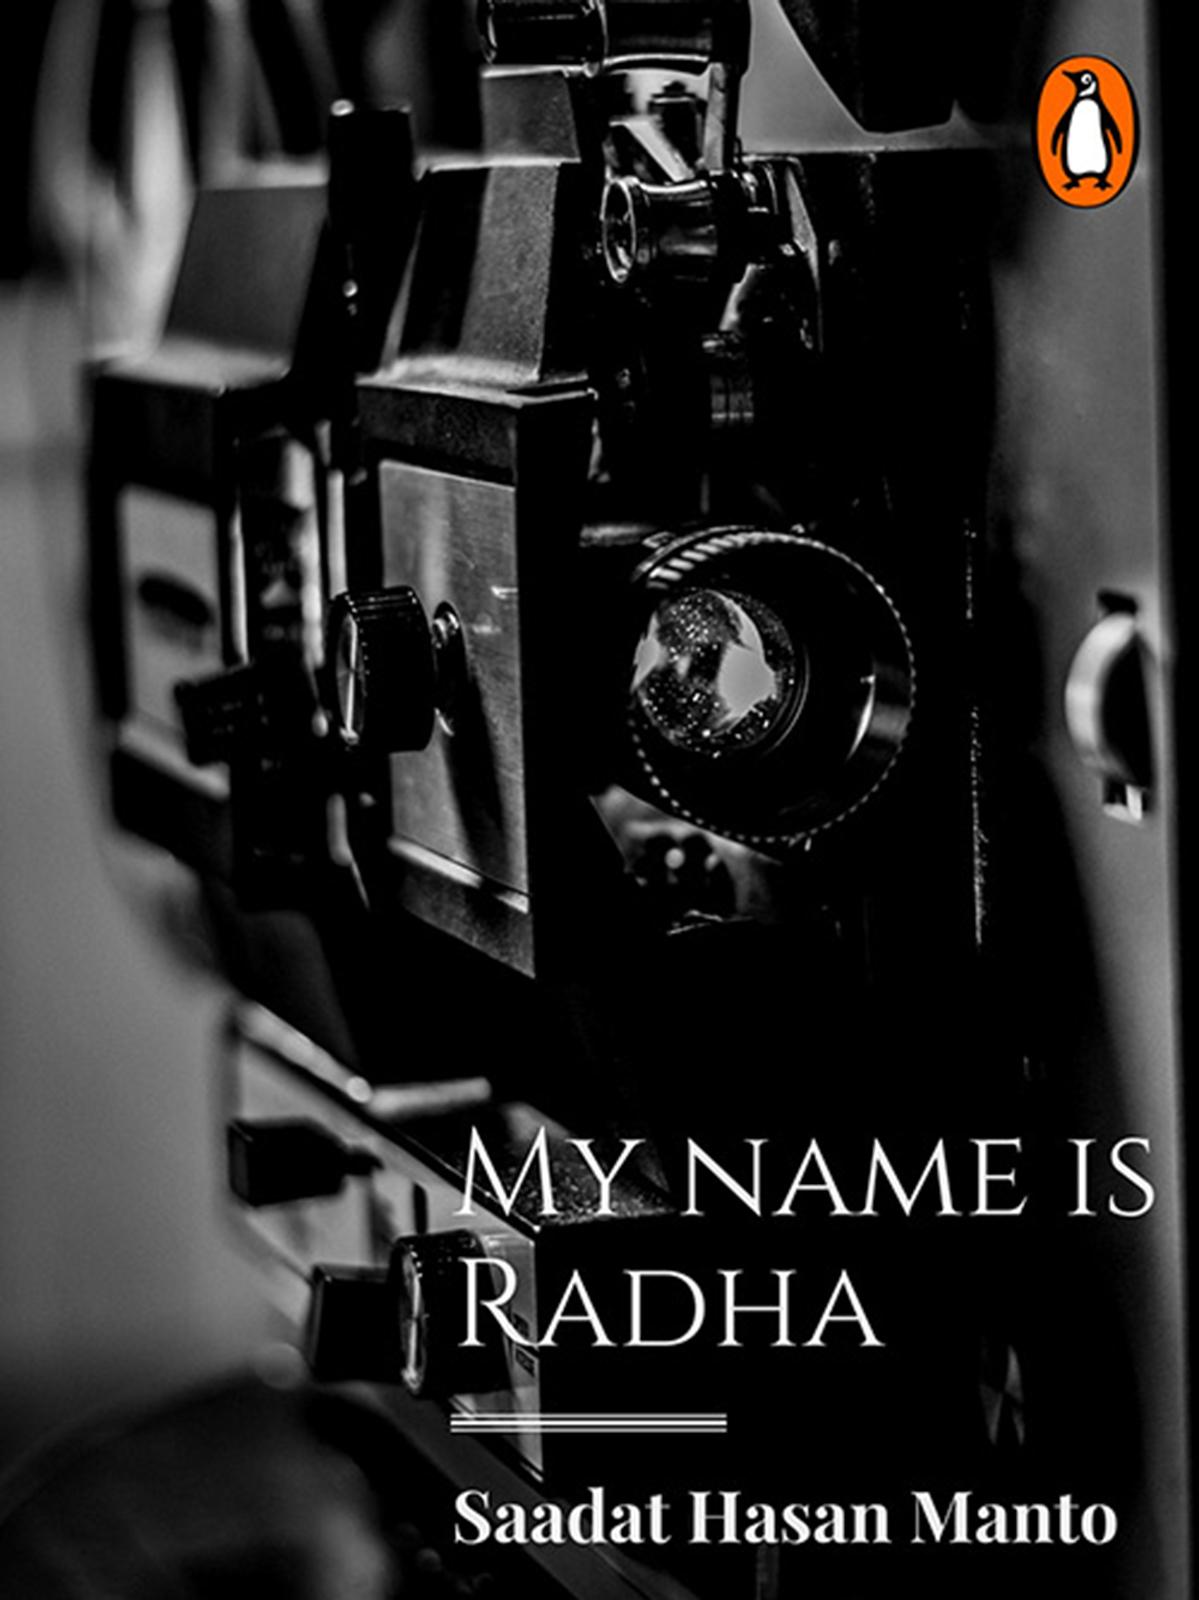 My Name is Radha